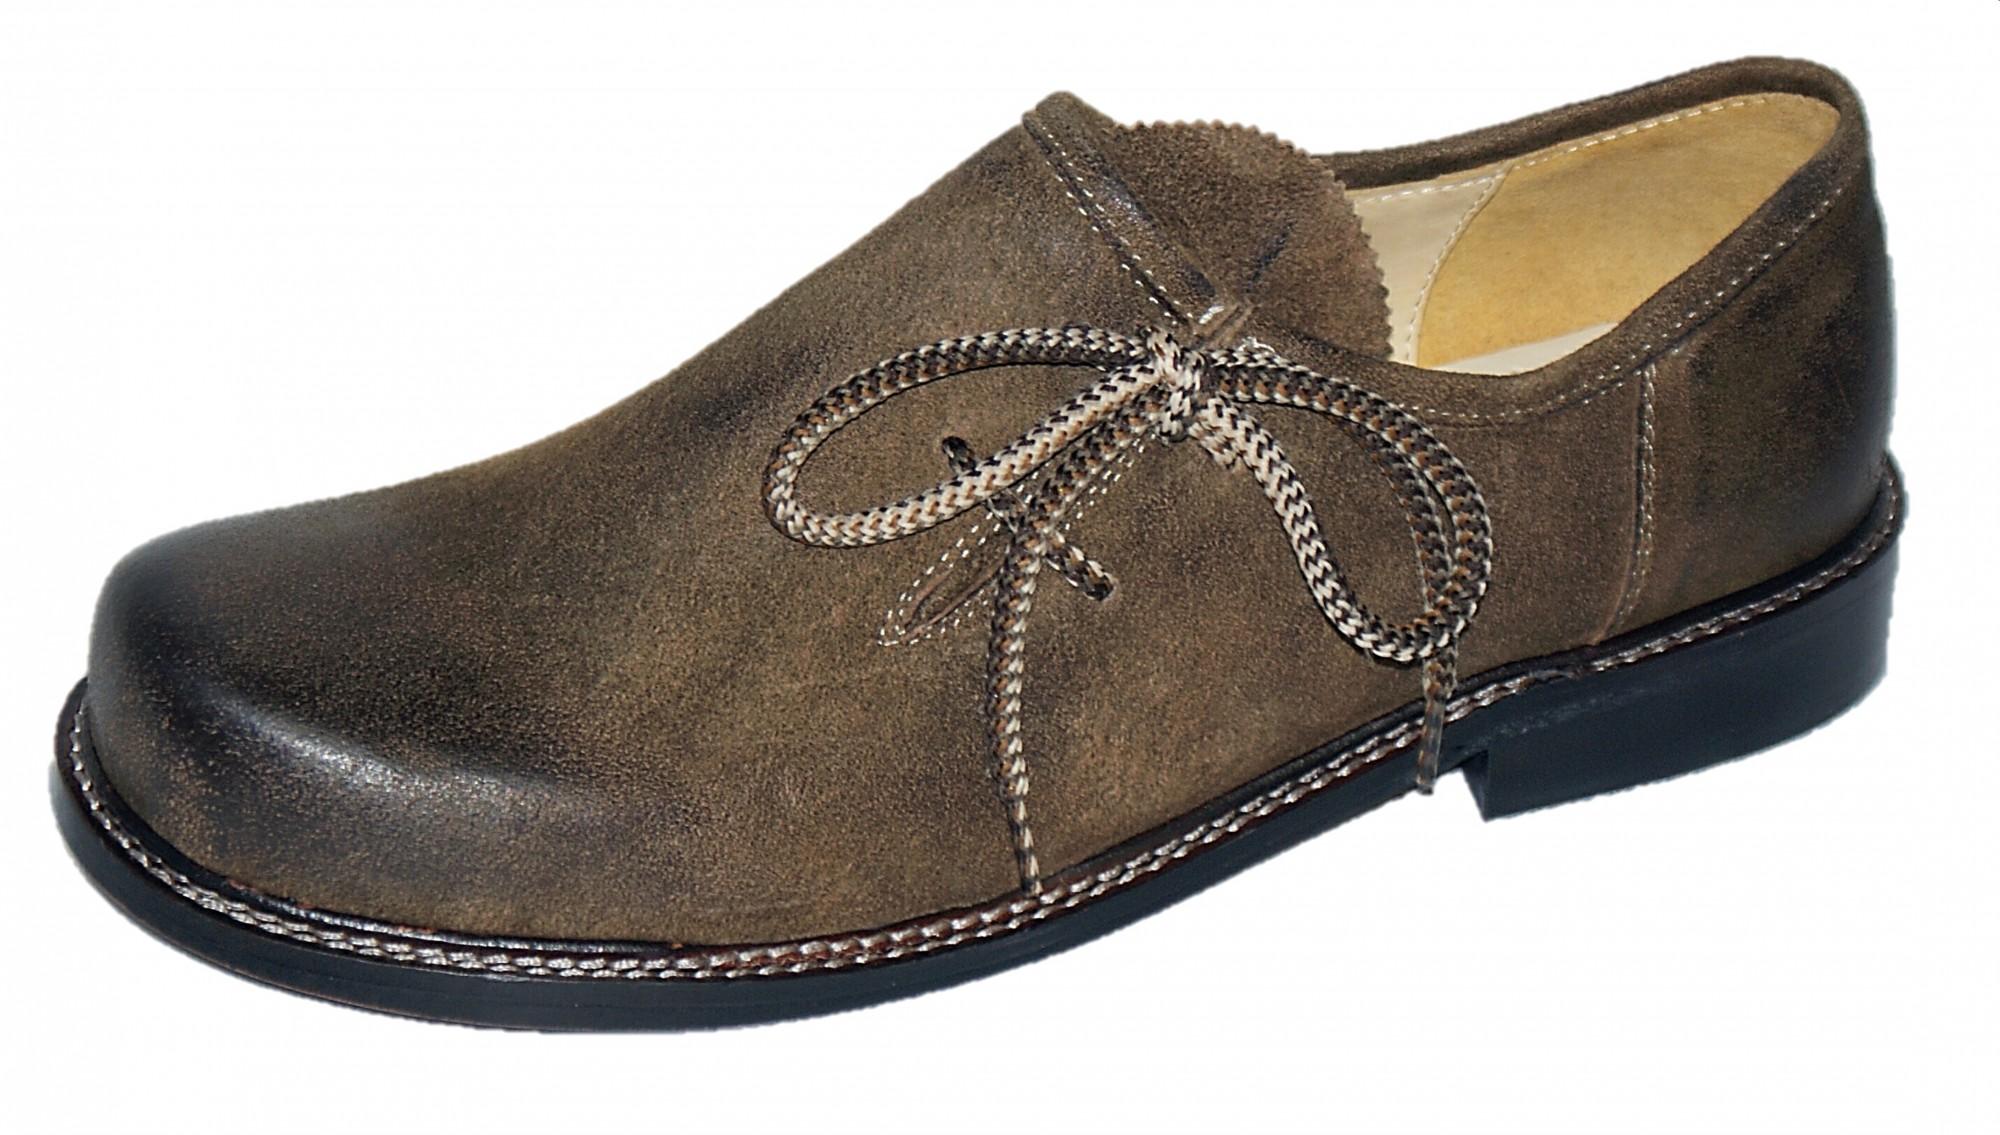 Trachtenschuhe Haferlschuhe Trachten Schuhe Leder braun Ledersohle Schnürschuhe